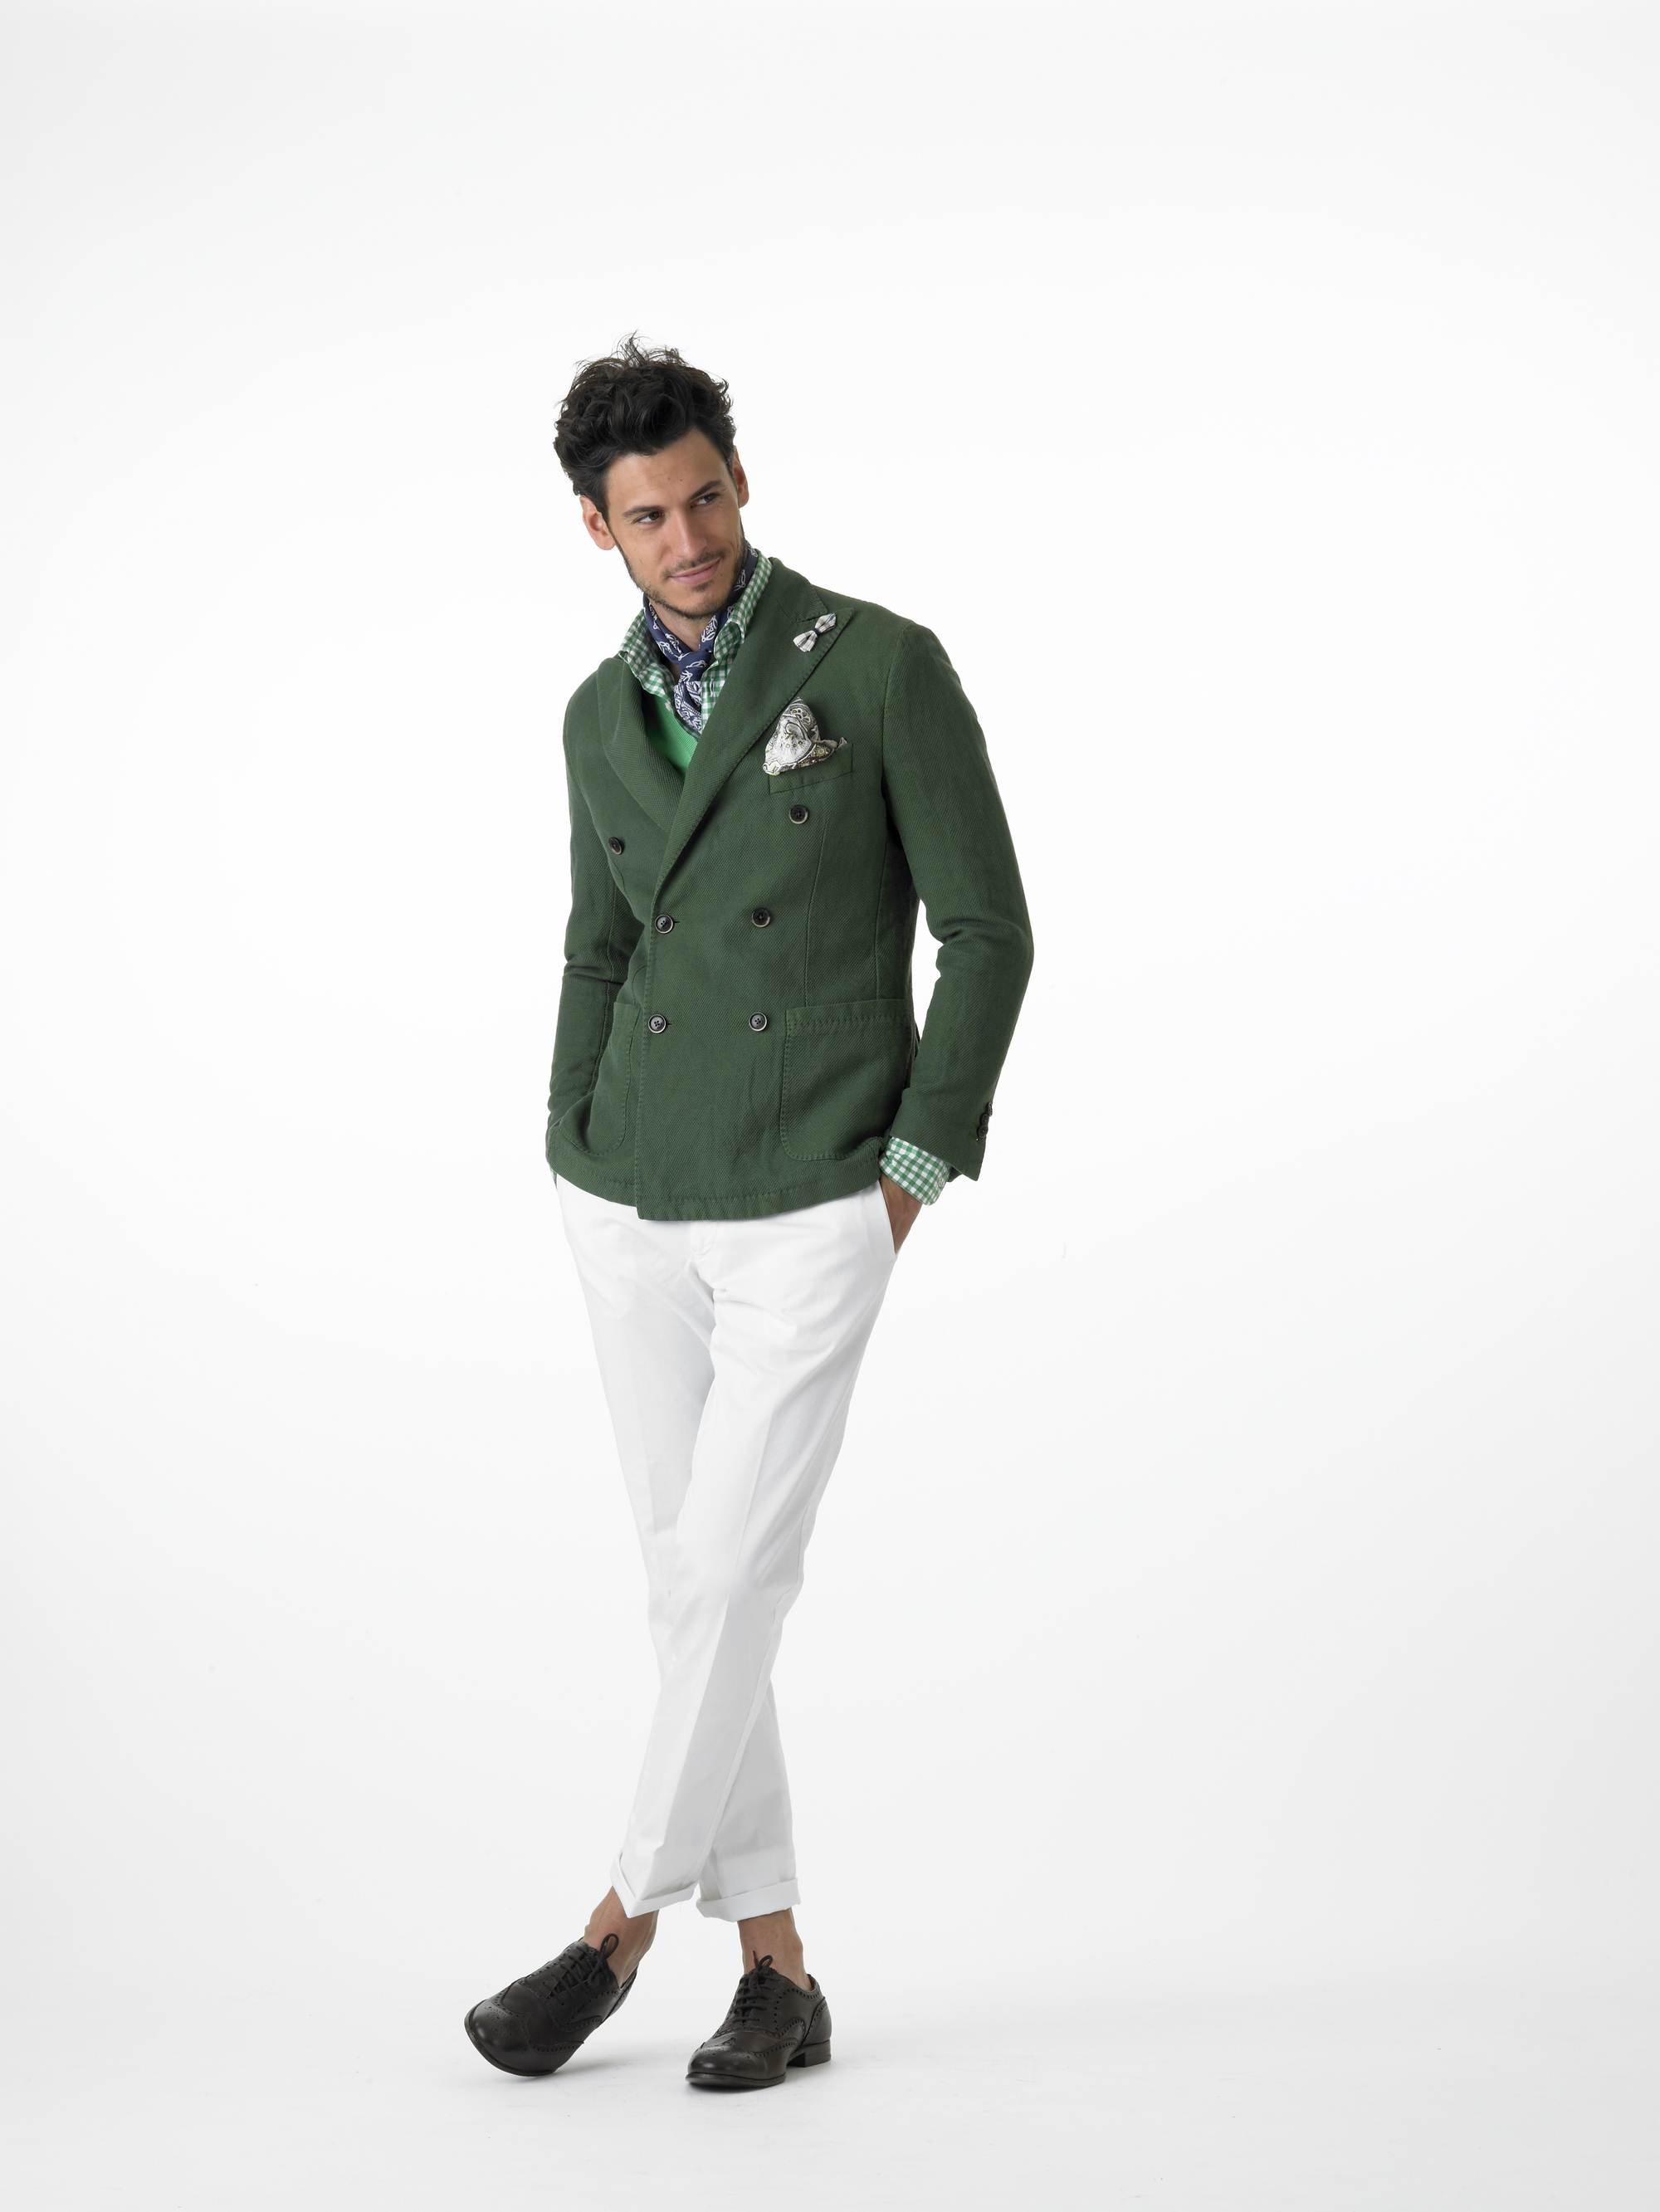 Moda Uomo 2017: tendenze chic